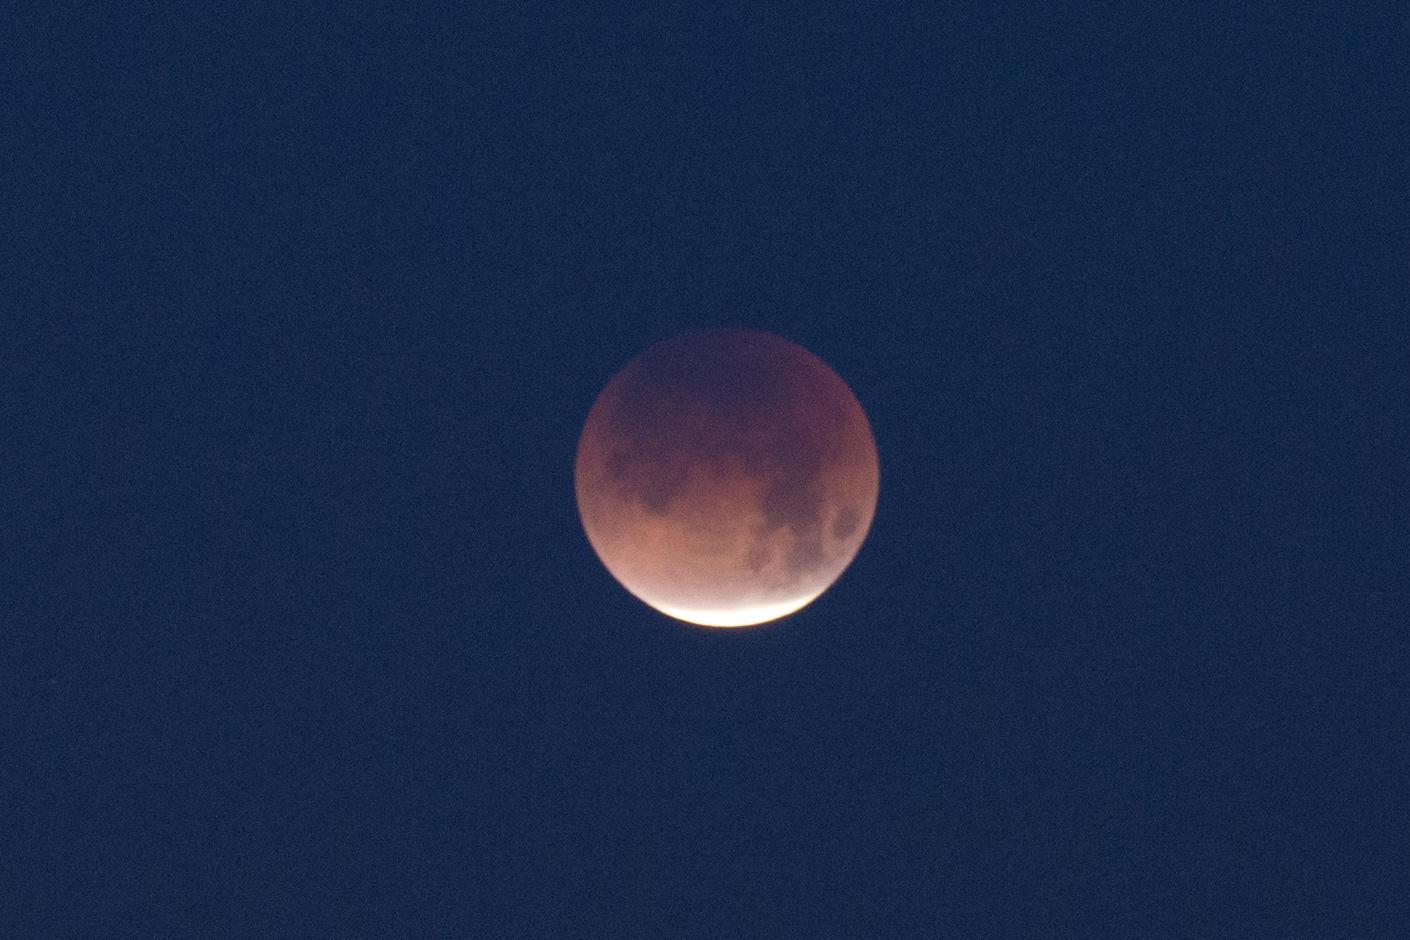 Blue Blood super moon by John E